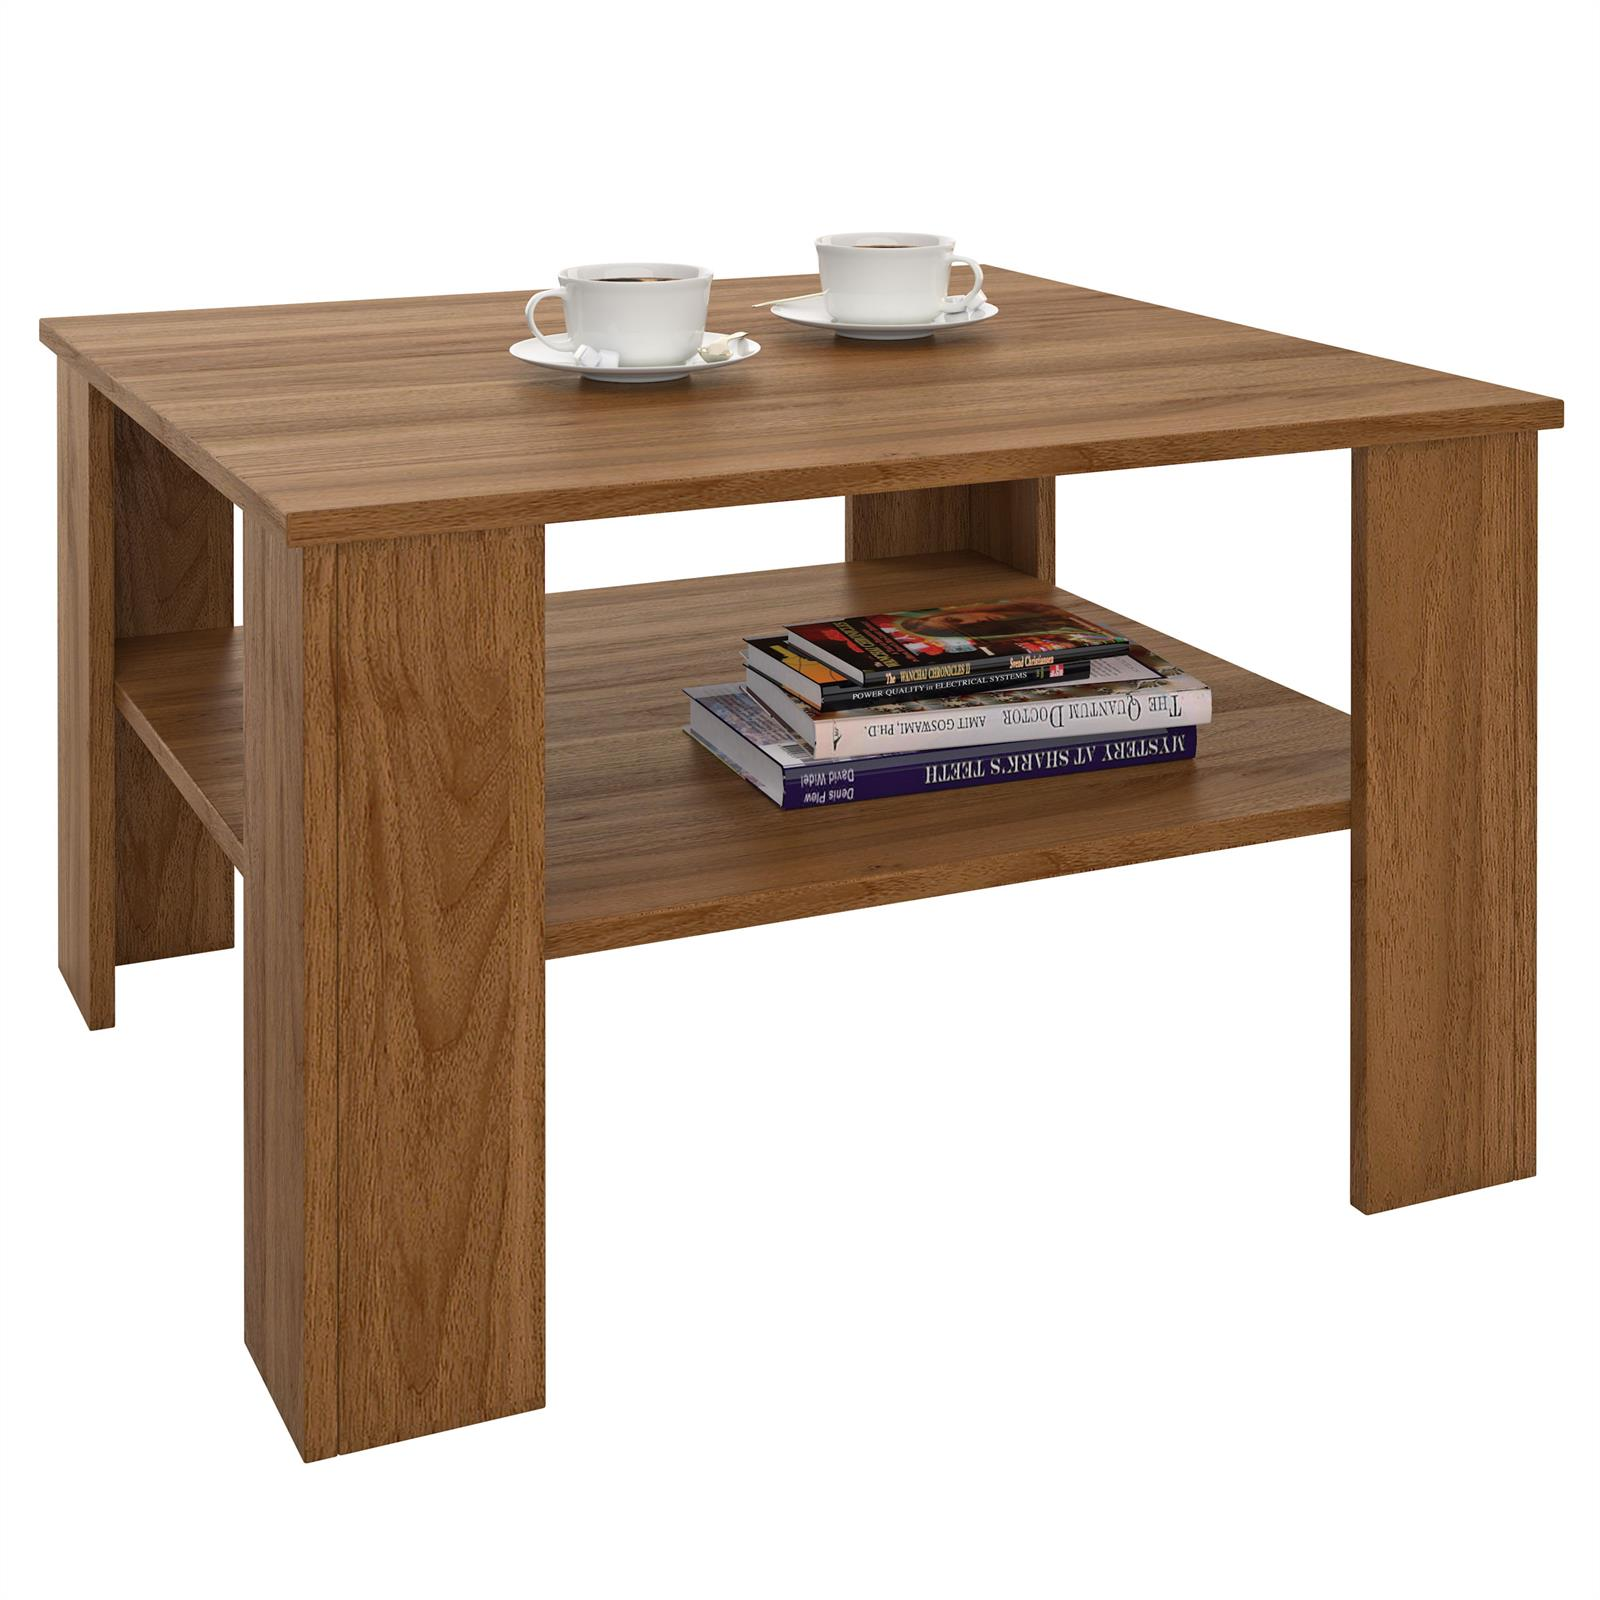 couchtisch felice in nussbaum 68 x 68 cm caro m bel. Black Bedroom Furniture Sets. Home Design Ideas